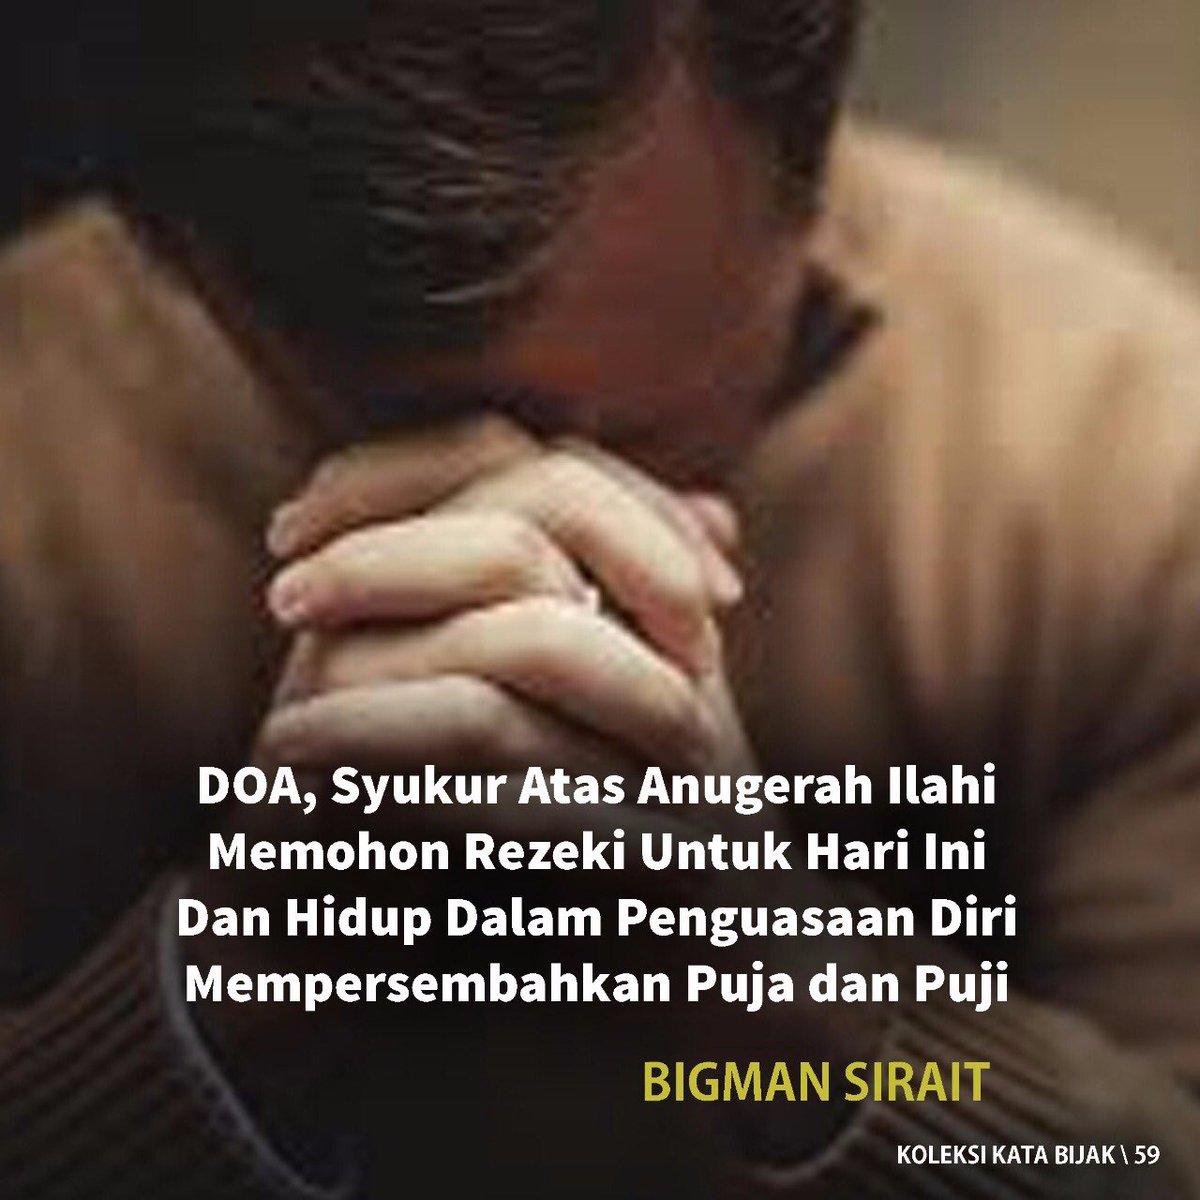 Pdt Bigman Sirait Auf Twitter Yaypama Yayasanpama